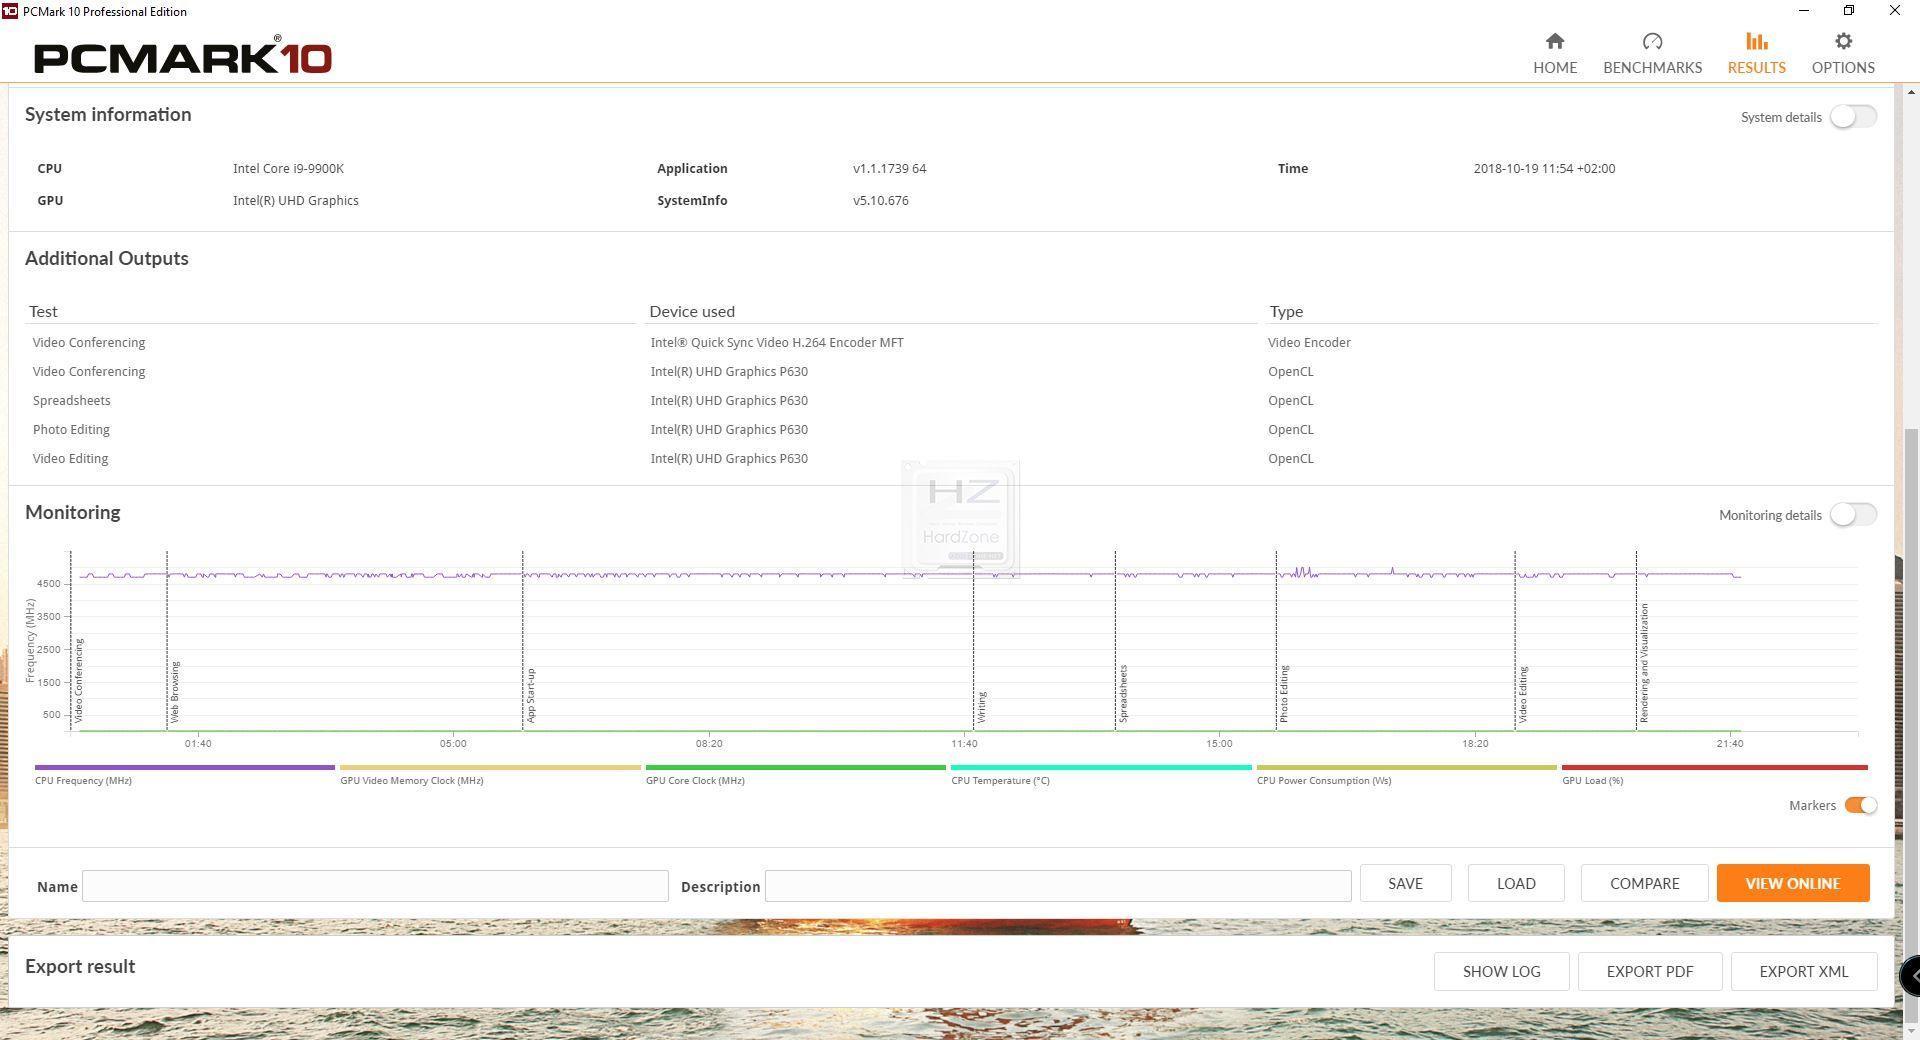 Intel i9 9900K PCMark - Review 2